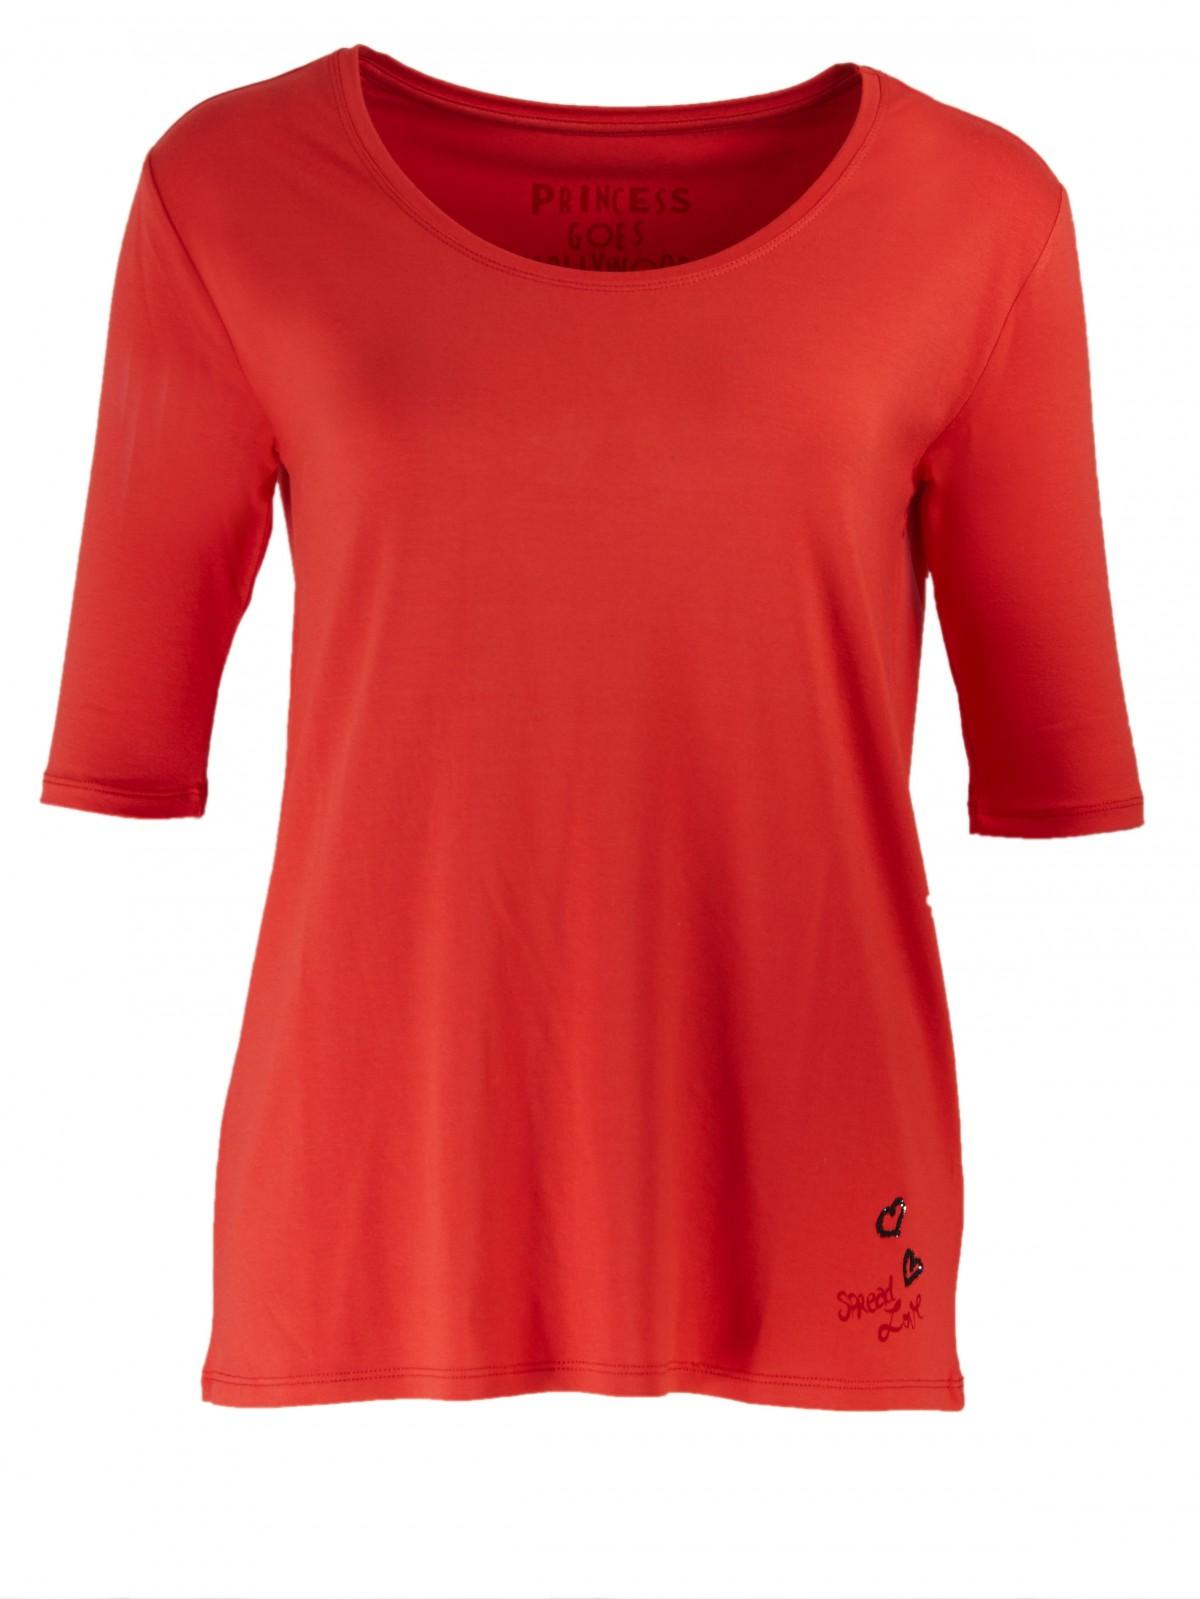 Basic Halbarm T-Shirt in Flame